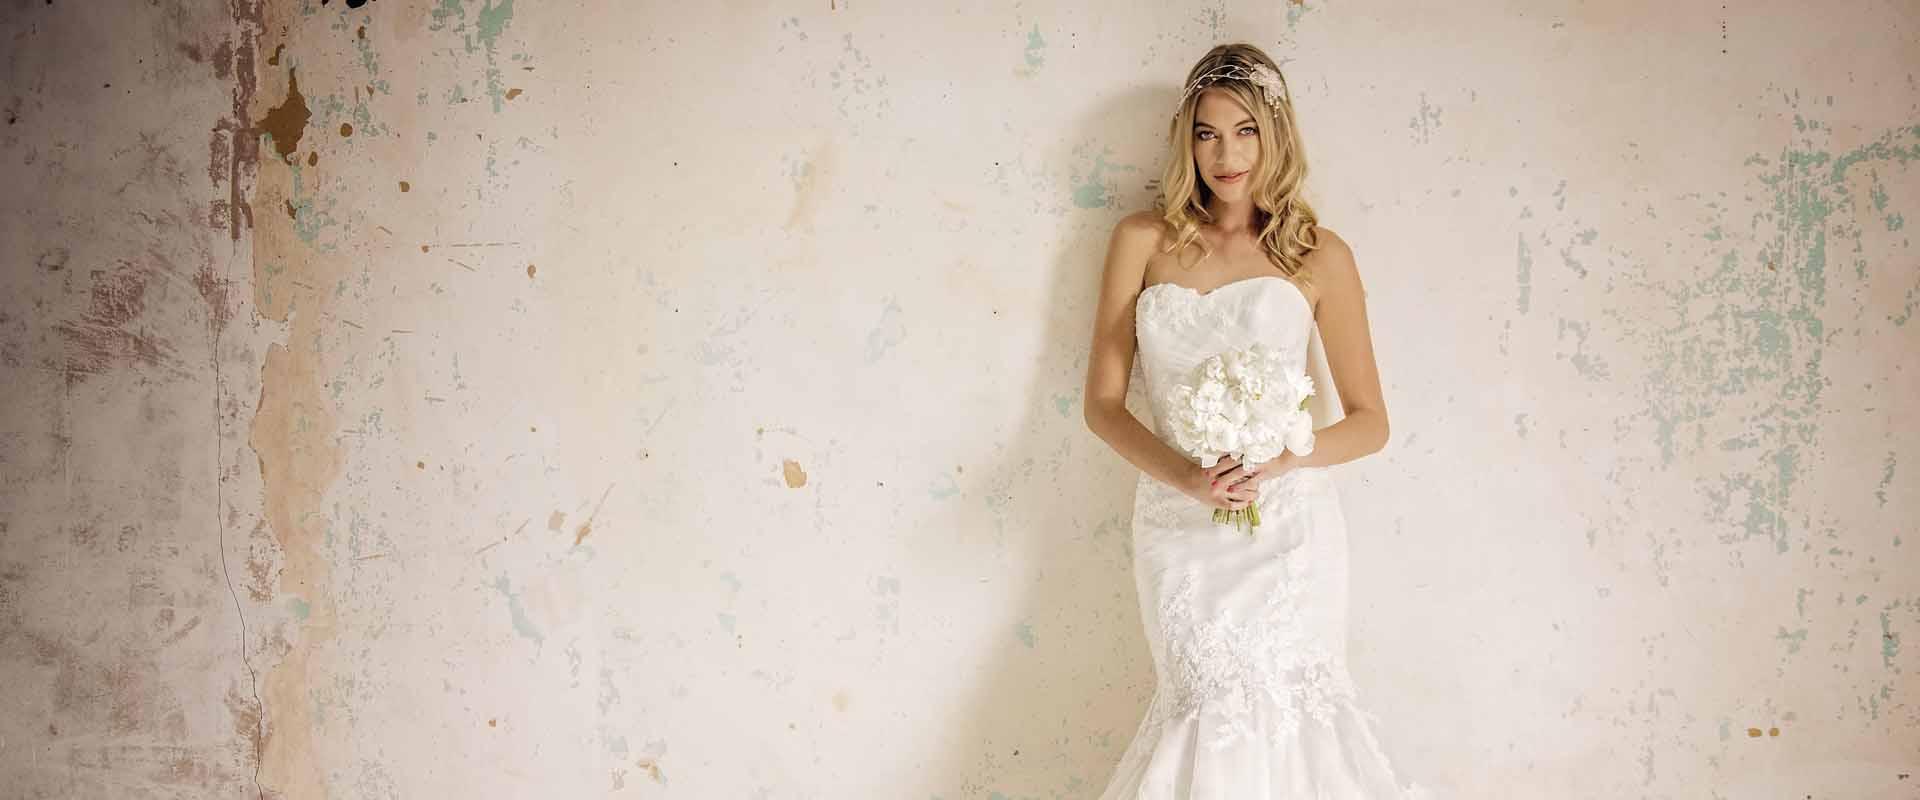 bridal photo shoot in London